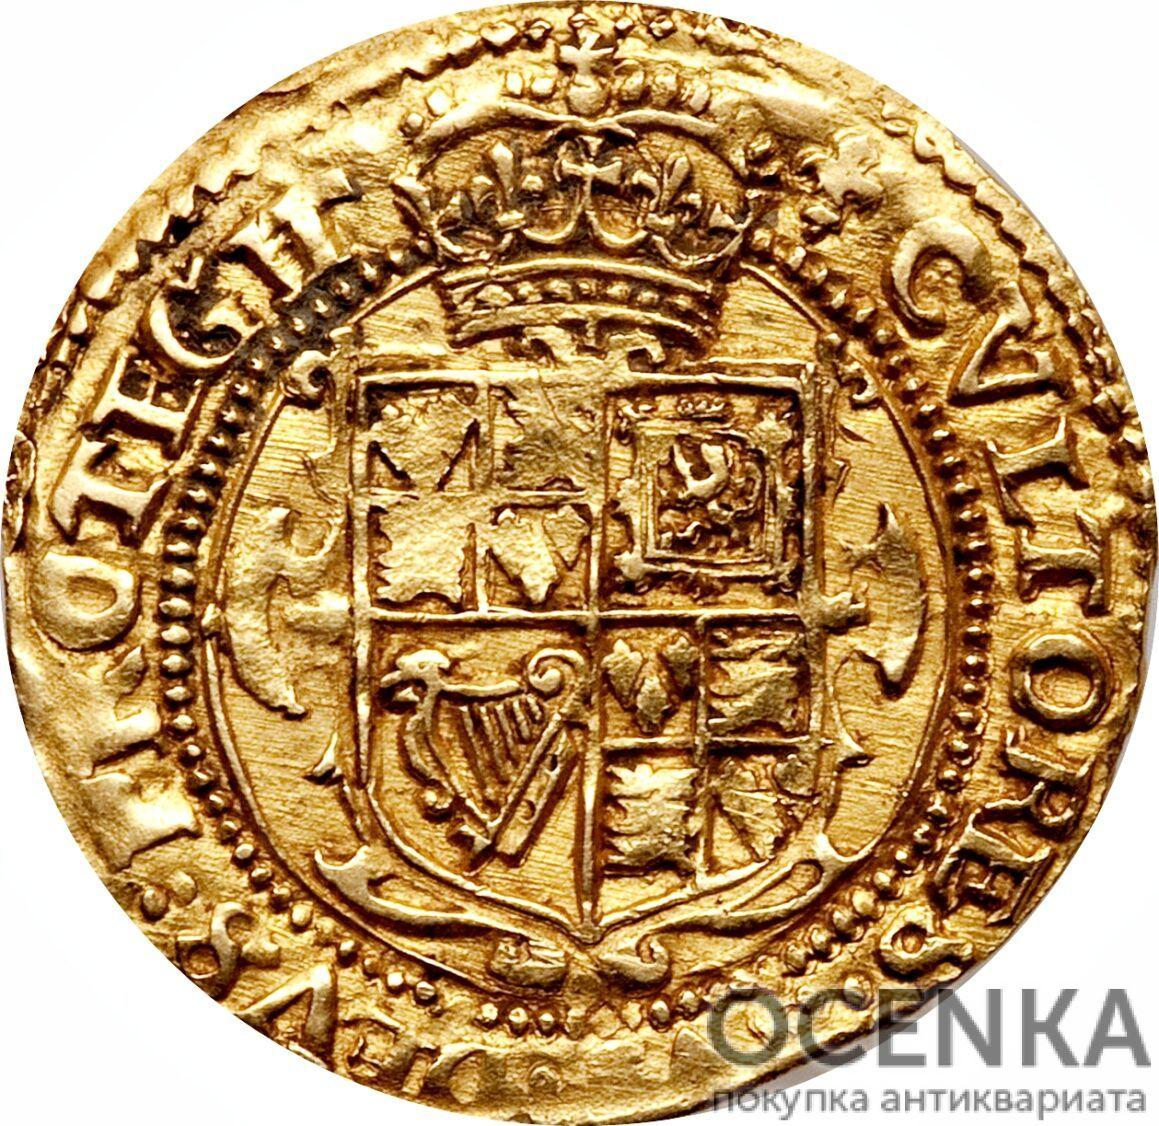 Золотая монета 1 Crown (крона) Великобритания - 9